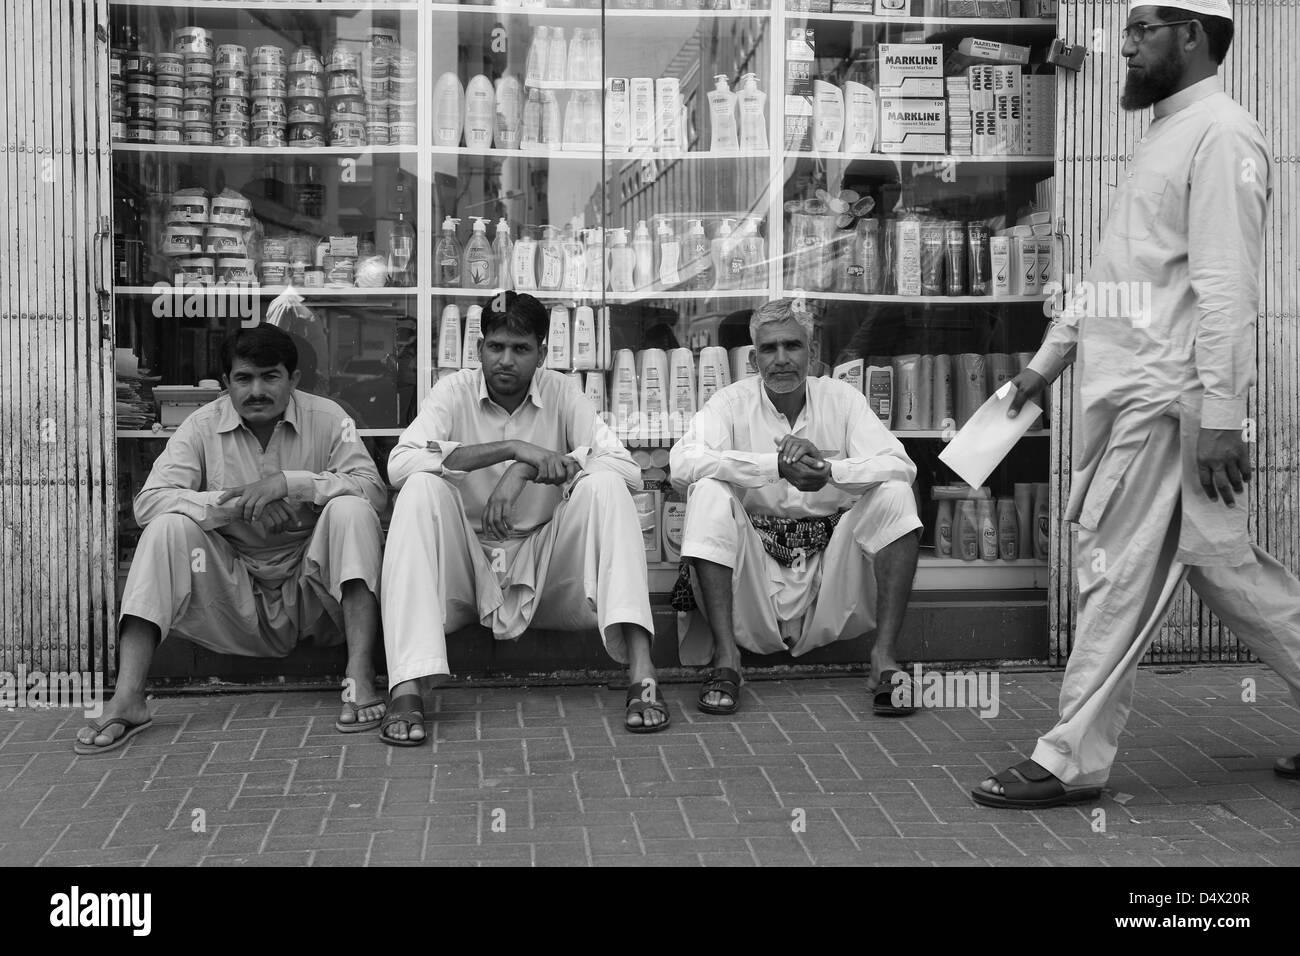 Three men sitting in front of shop window, Dubai, United Arab Emirates - Stock Image